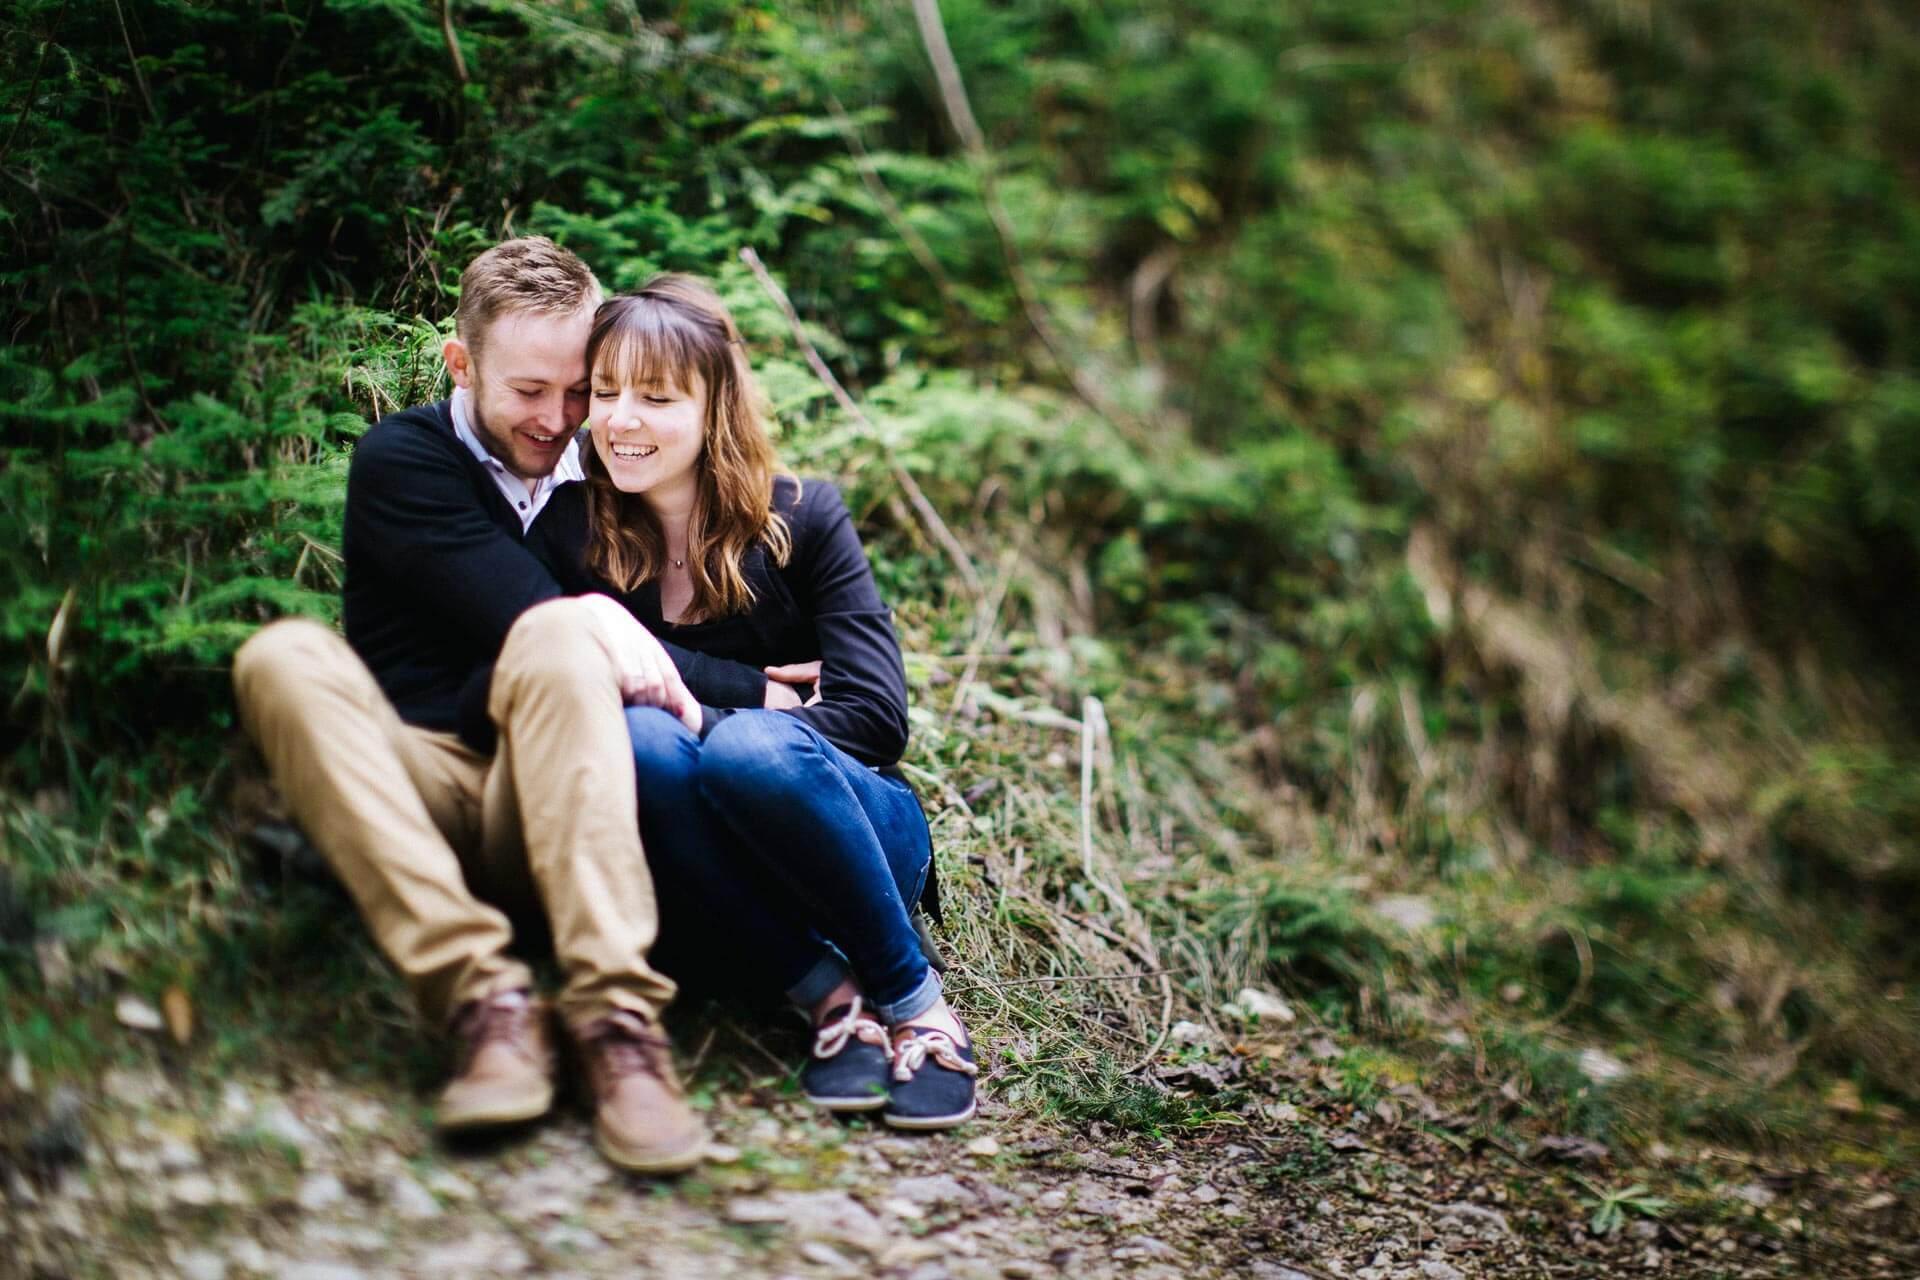 39 - Photo couple free lensing